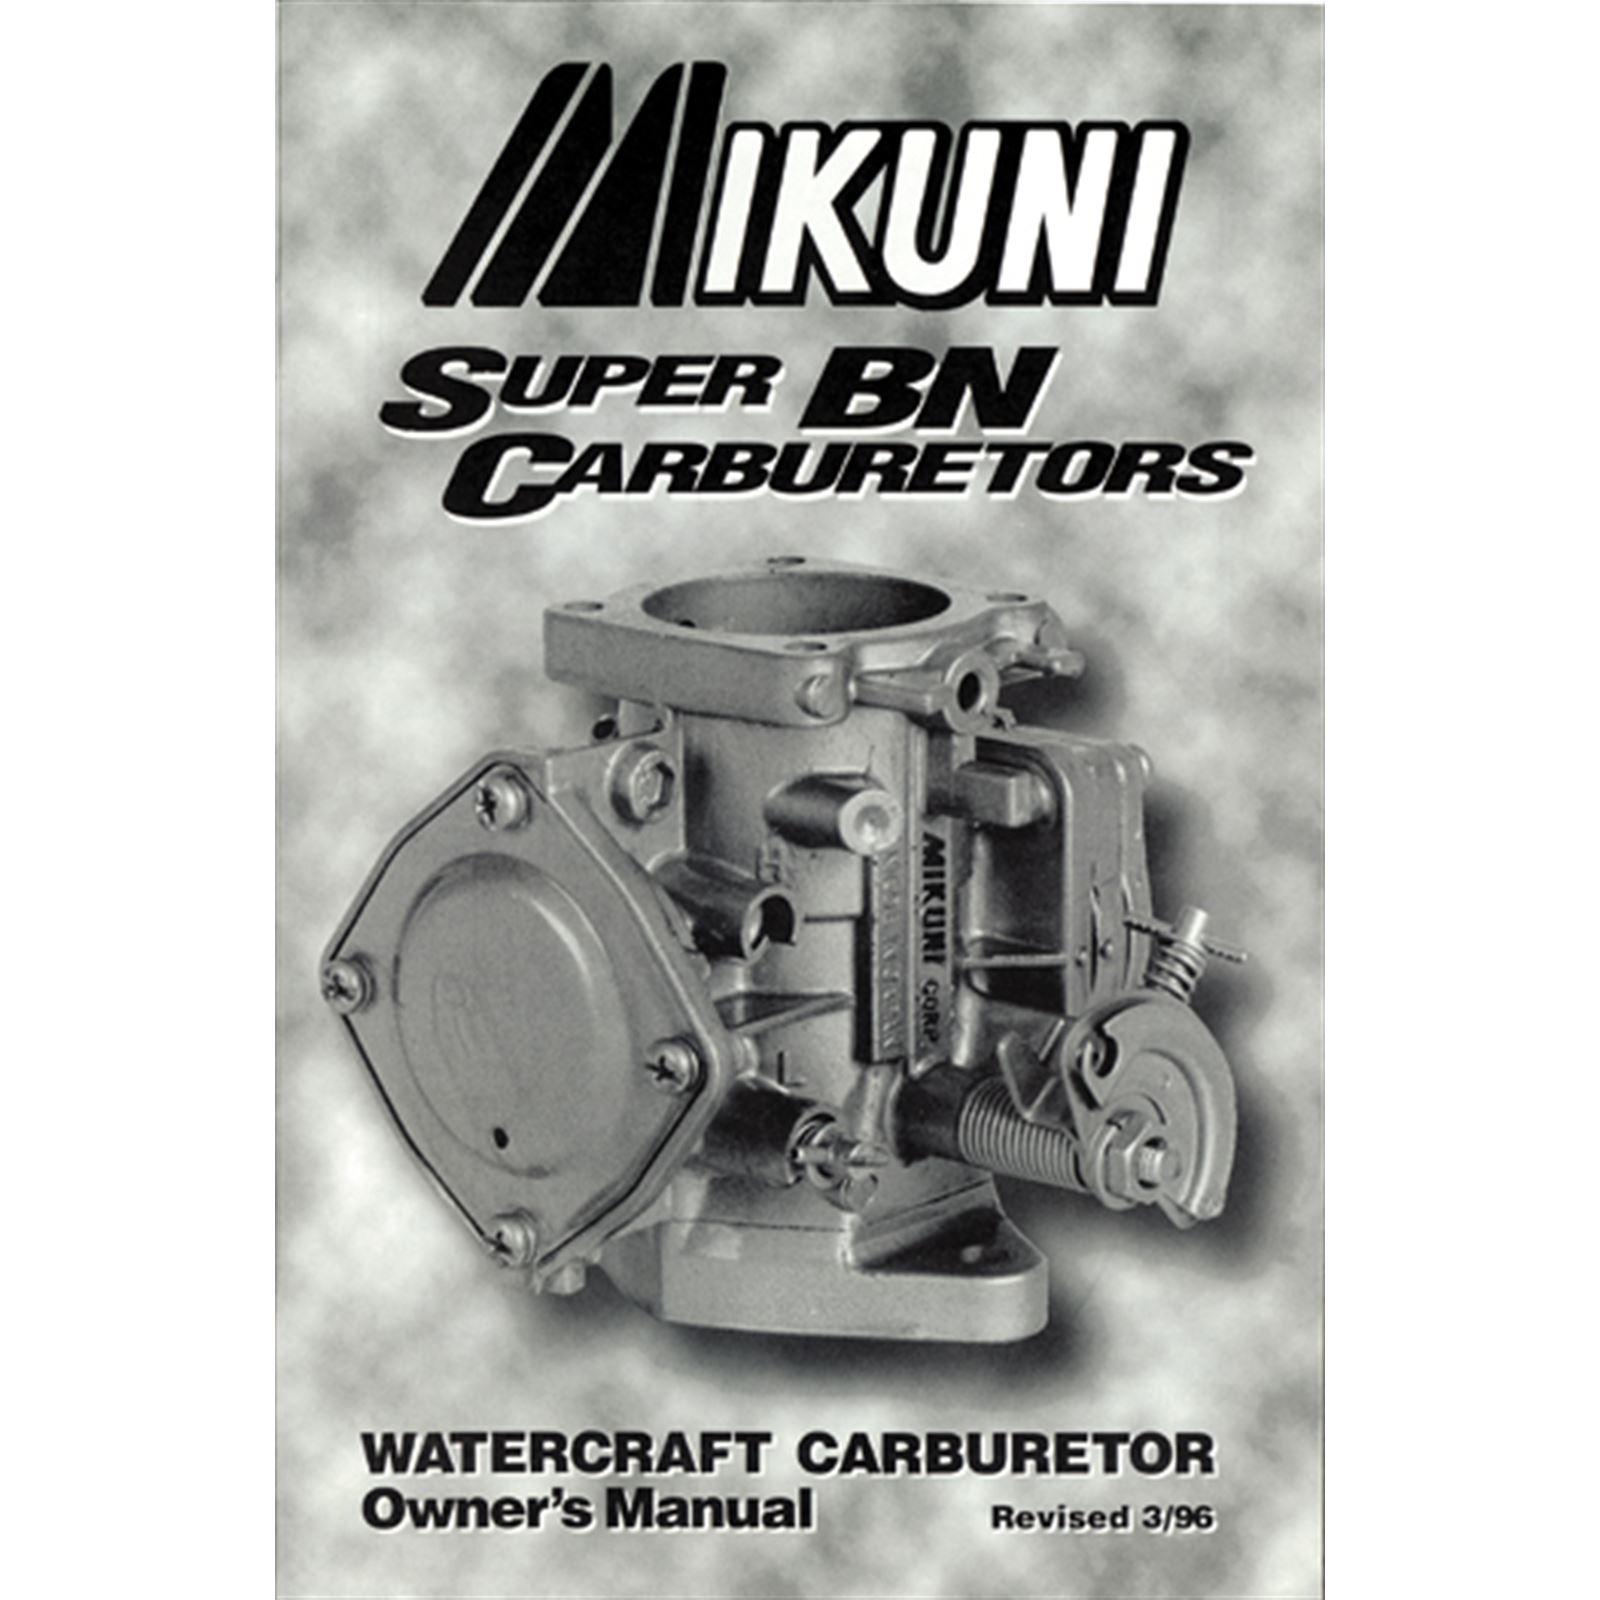 Mikuni Owners Manual for Super BN Carburetors